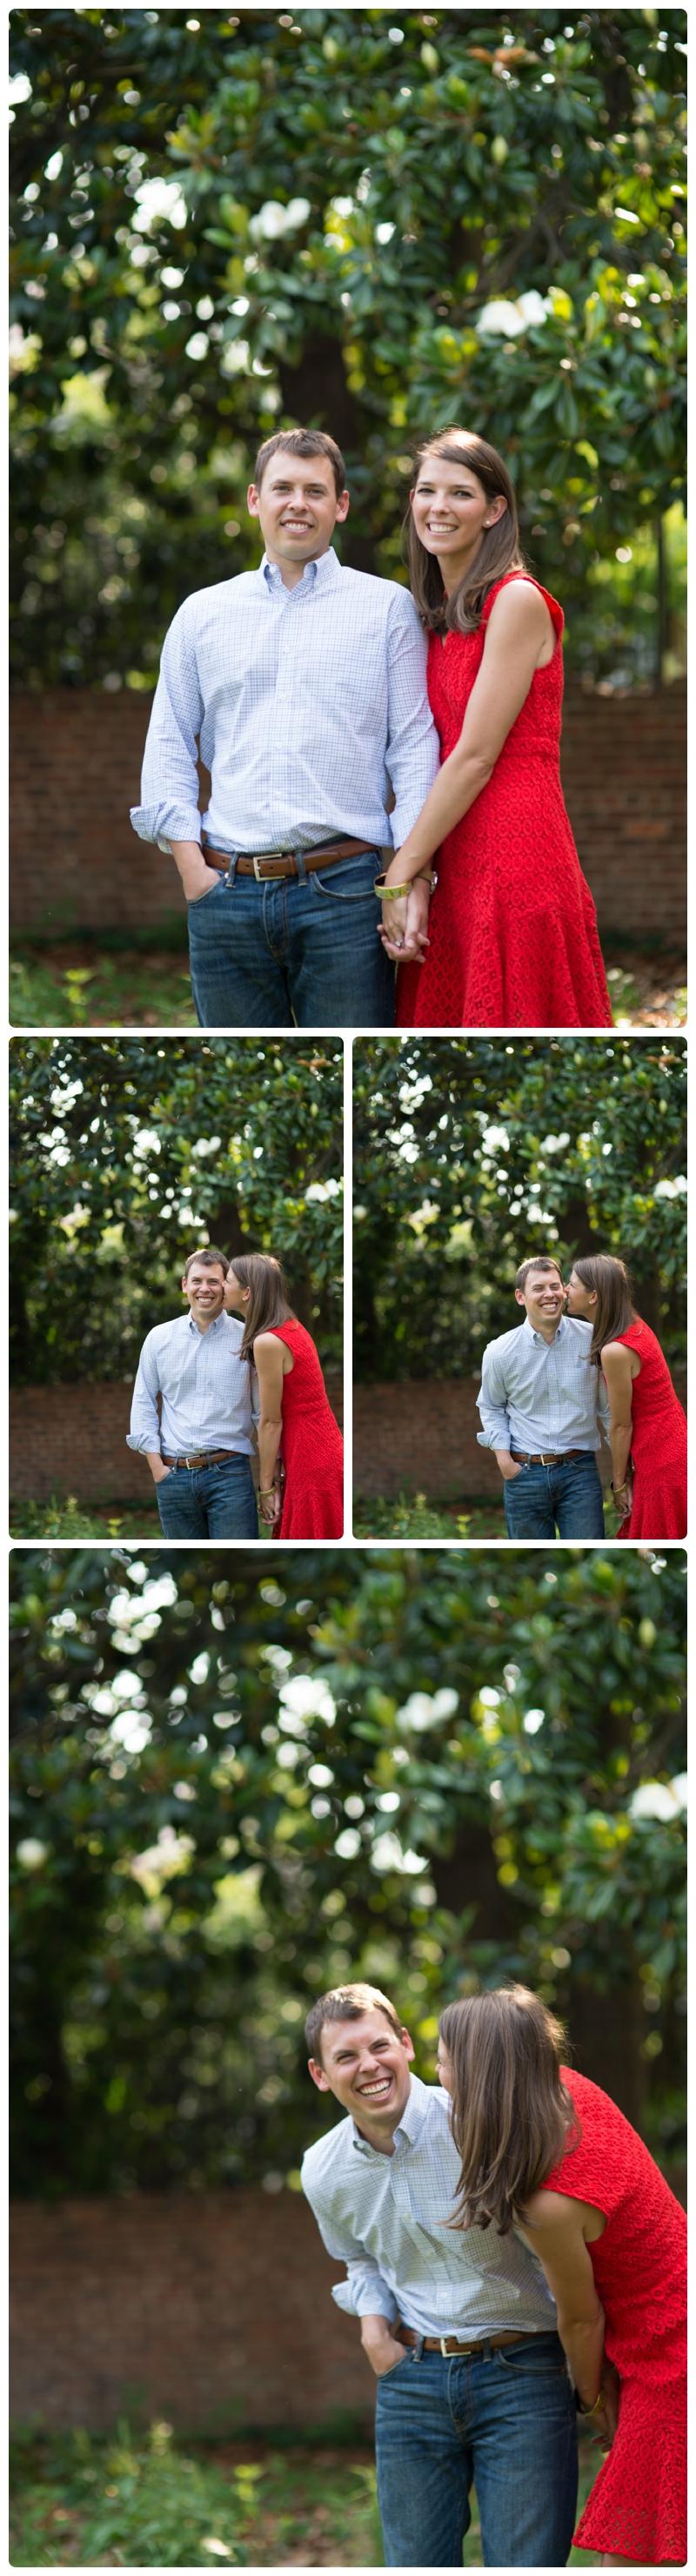 Engagement Photos in Georgetown, Washington, DC by www.rachaelfosterphoto.com_0014.jpg